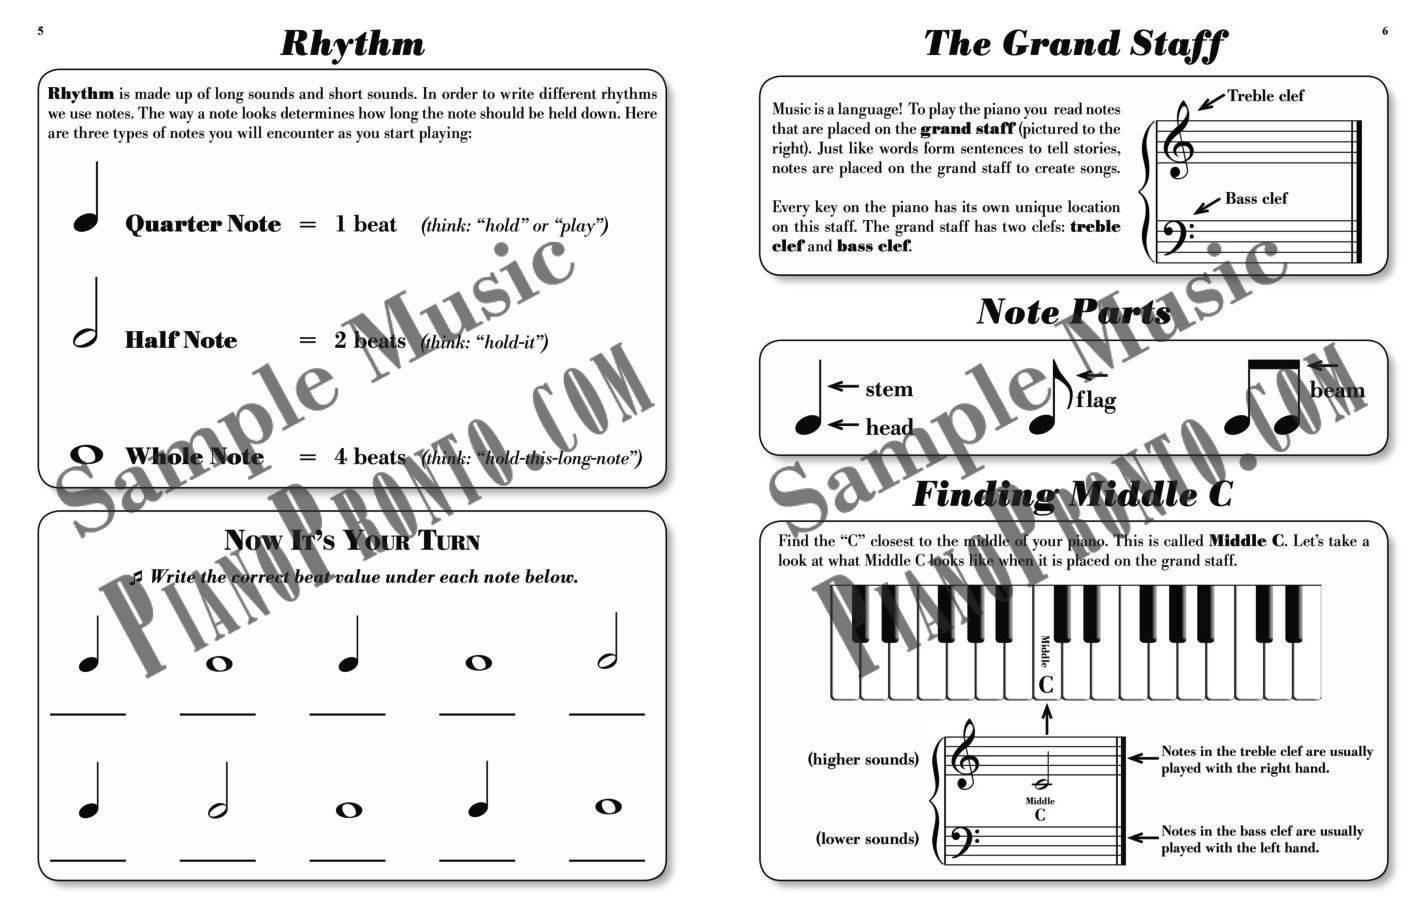 Piano pronto prelude hardcopy method book piano pronto piano pronto method book guide hexwebz Gallery